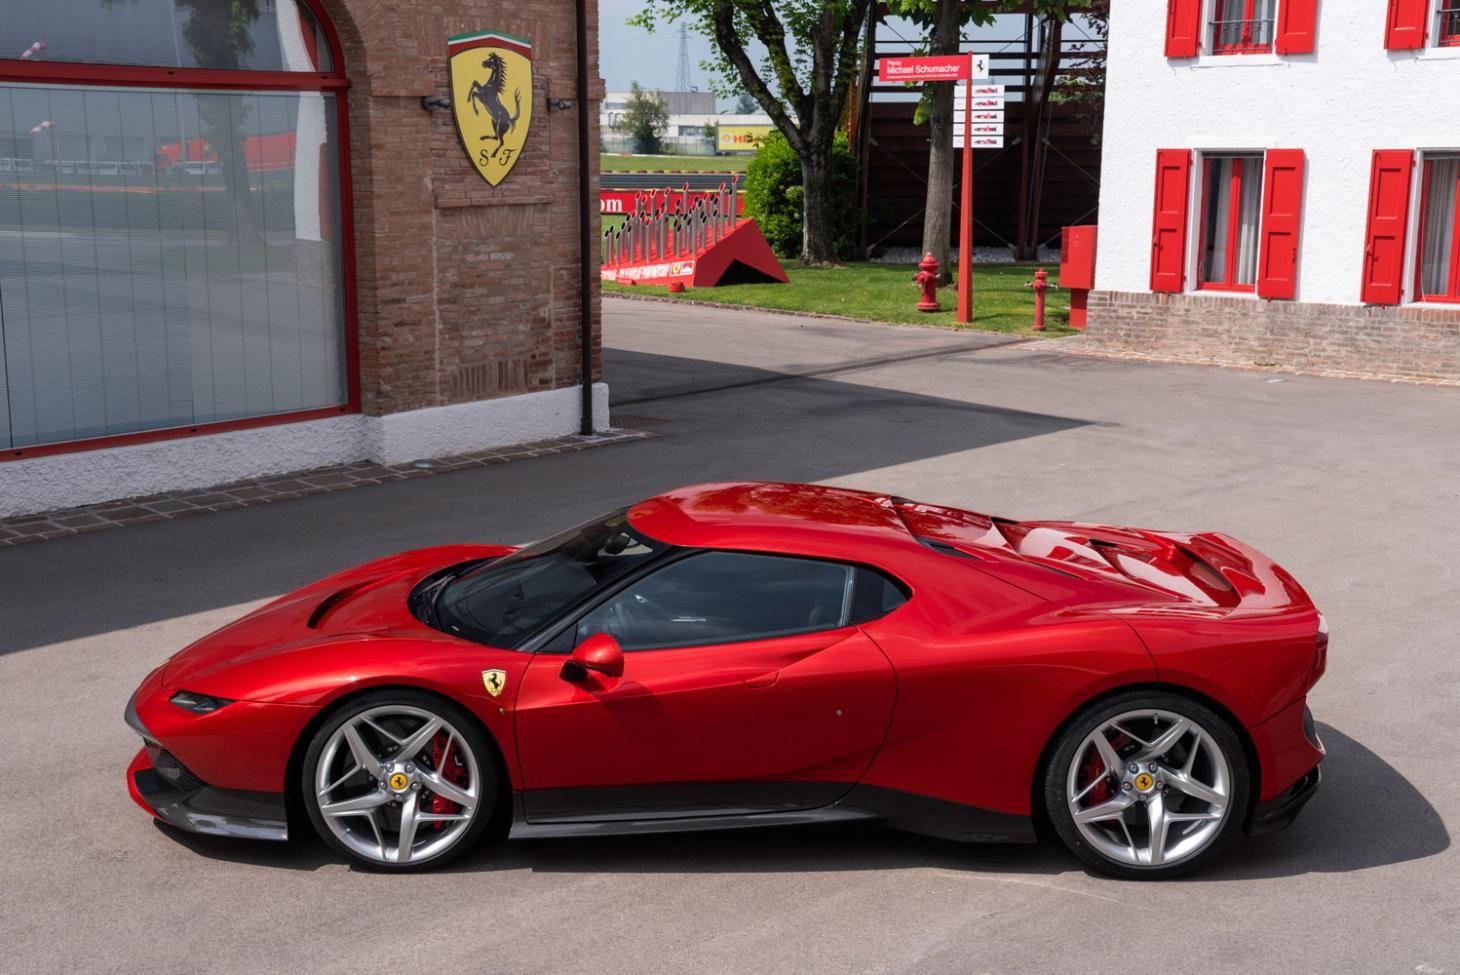 Ferrari Unveils A Surprise One Off Supercar Which Nostalgically Nods To 70s And 90s Car Design New Ferrari Ferrari New Sports Cars